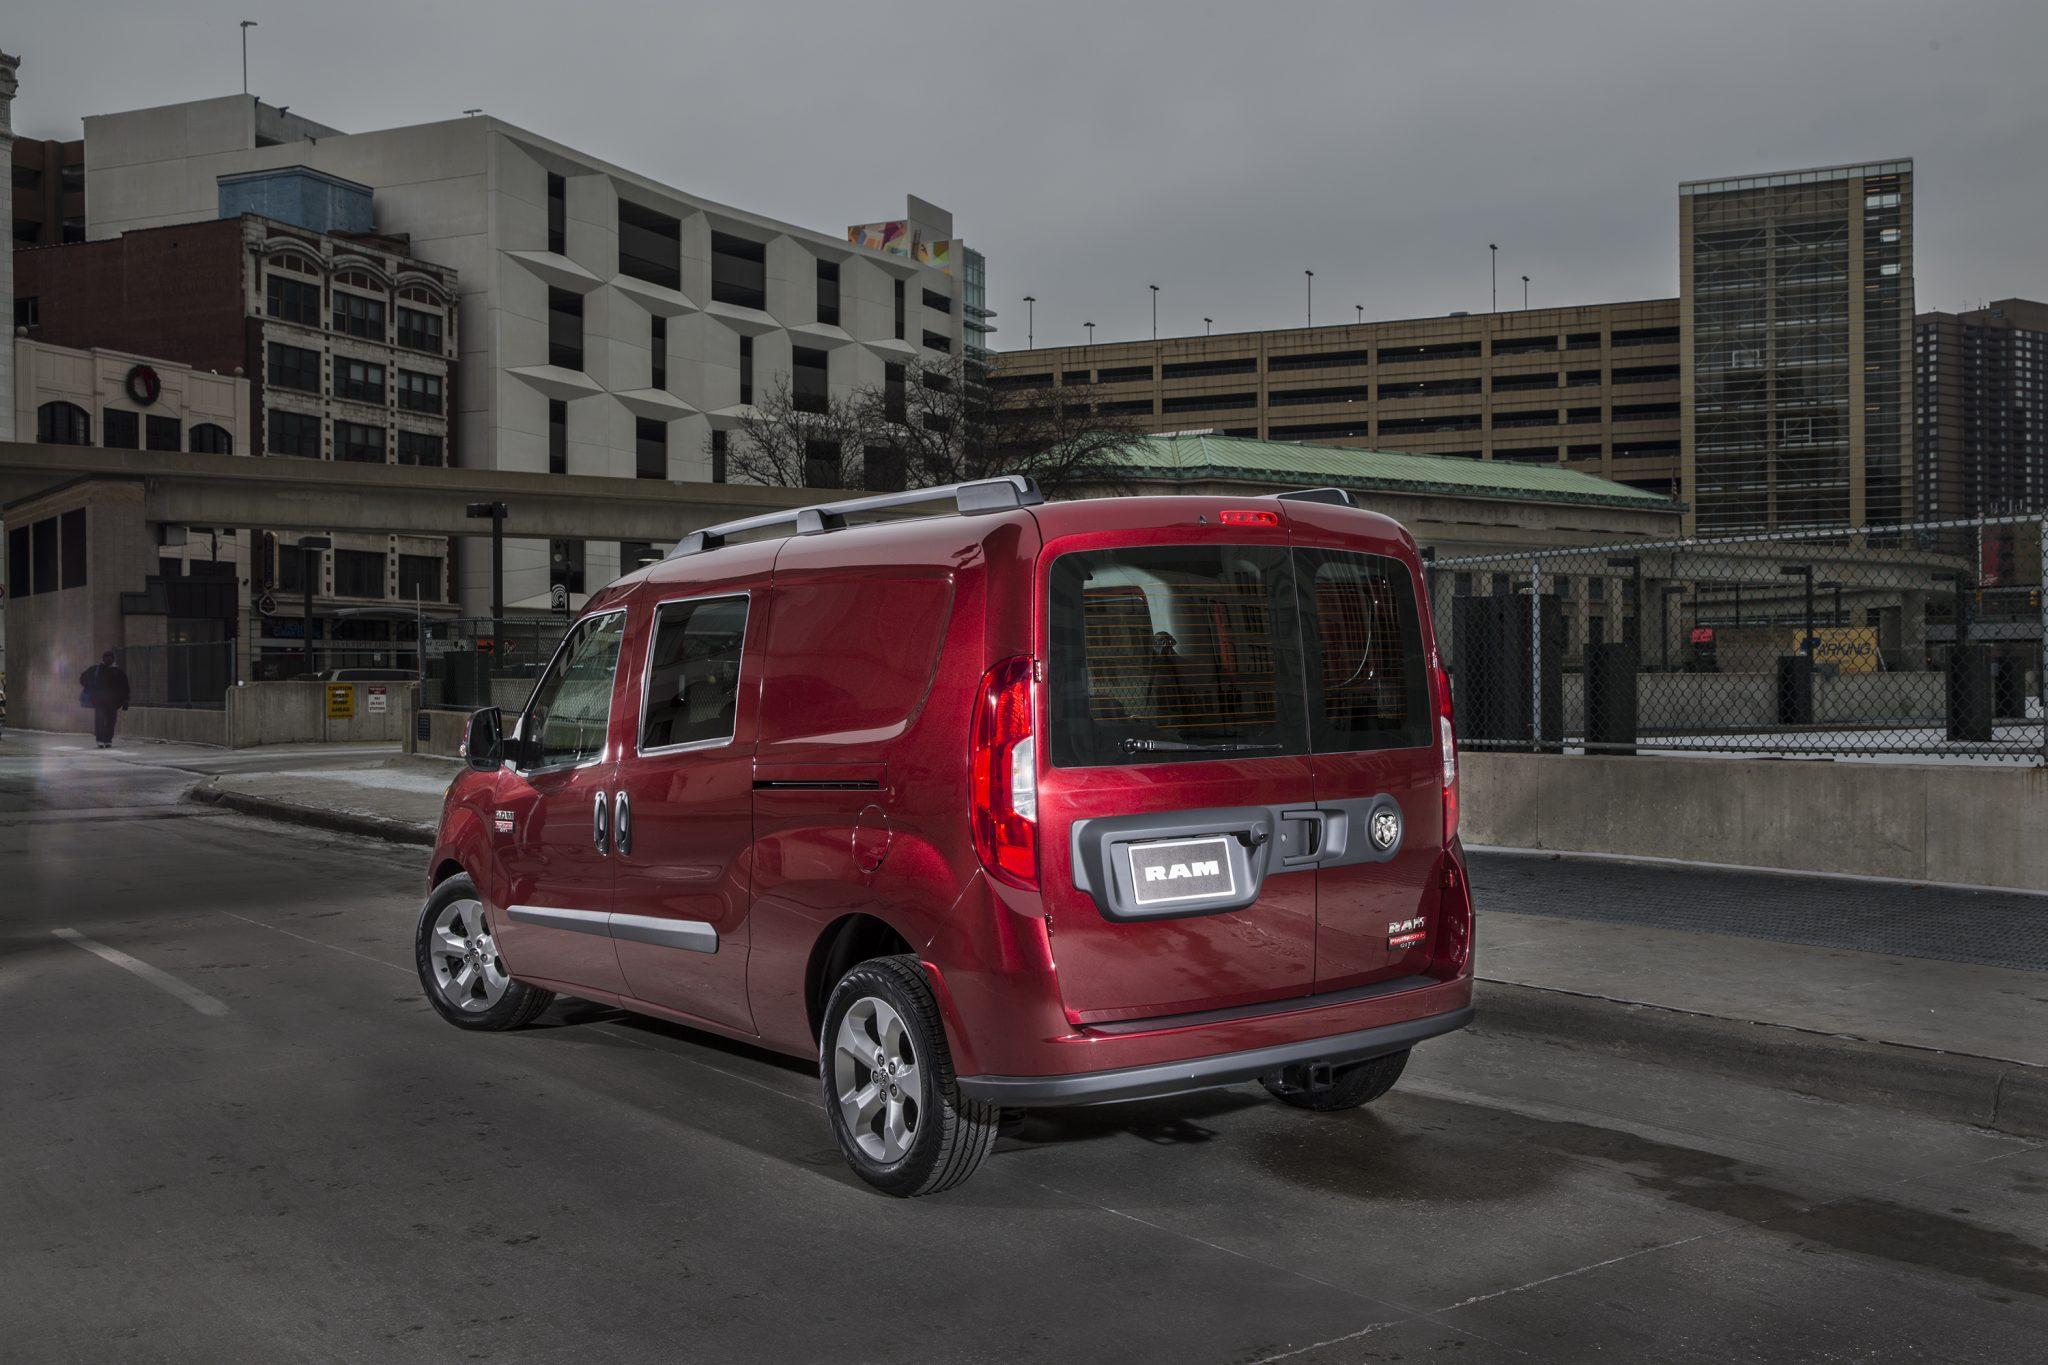 2015 Ram Promaster City Pricing Fuel Efficiency Announced The 2014 Dodge Van News Wheel